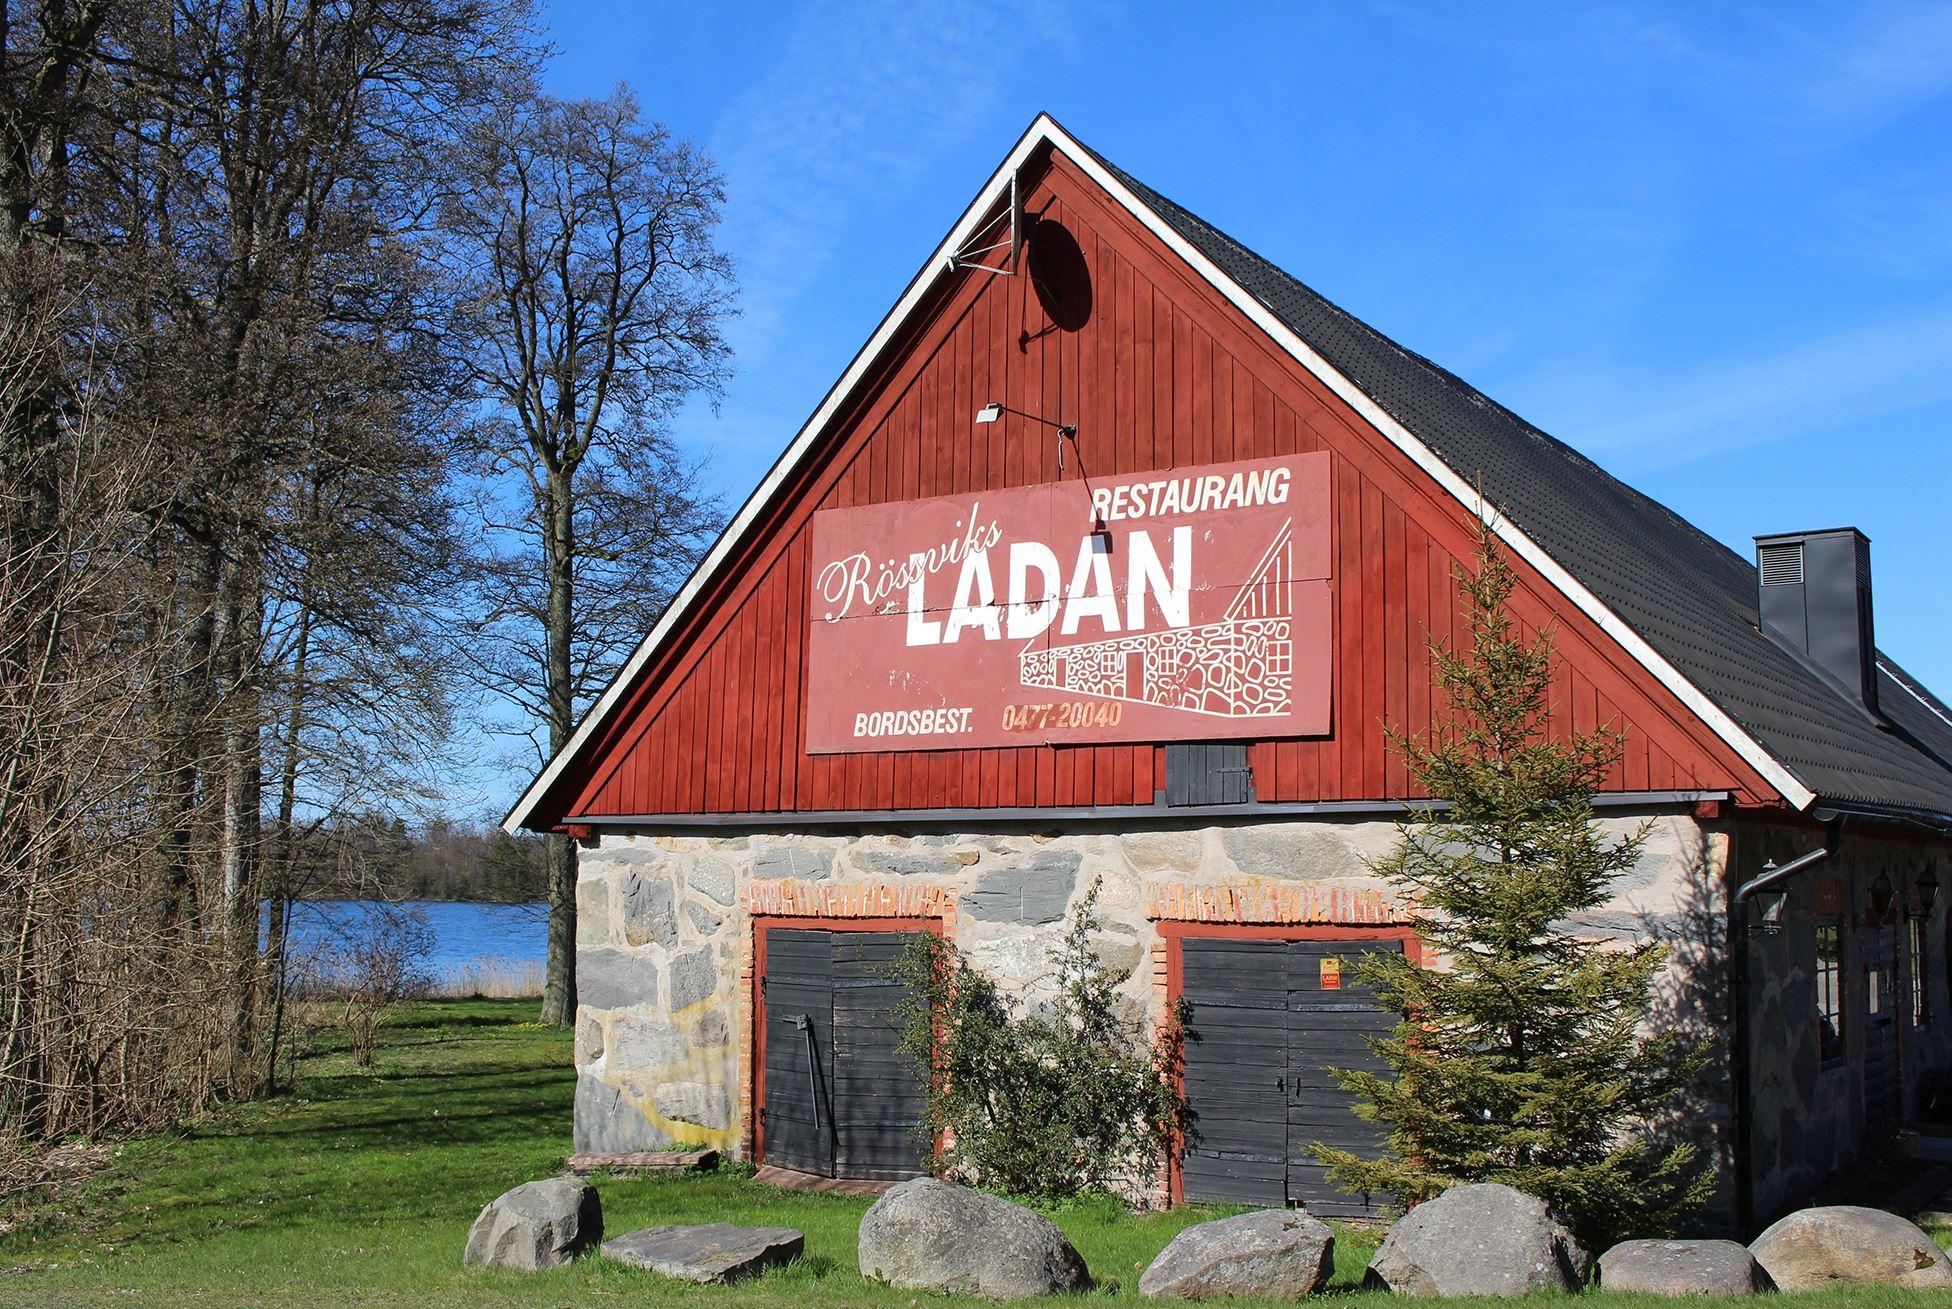 © Tingsryds kommun, Sofia Carlsson, Restaurang Ladan